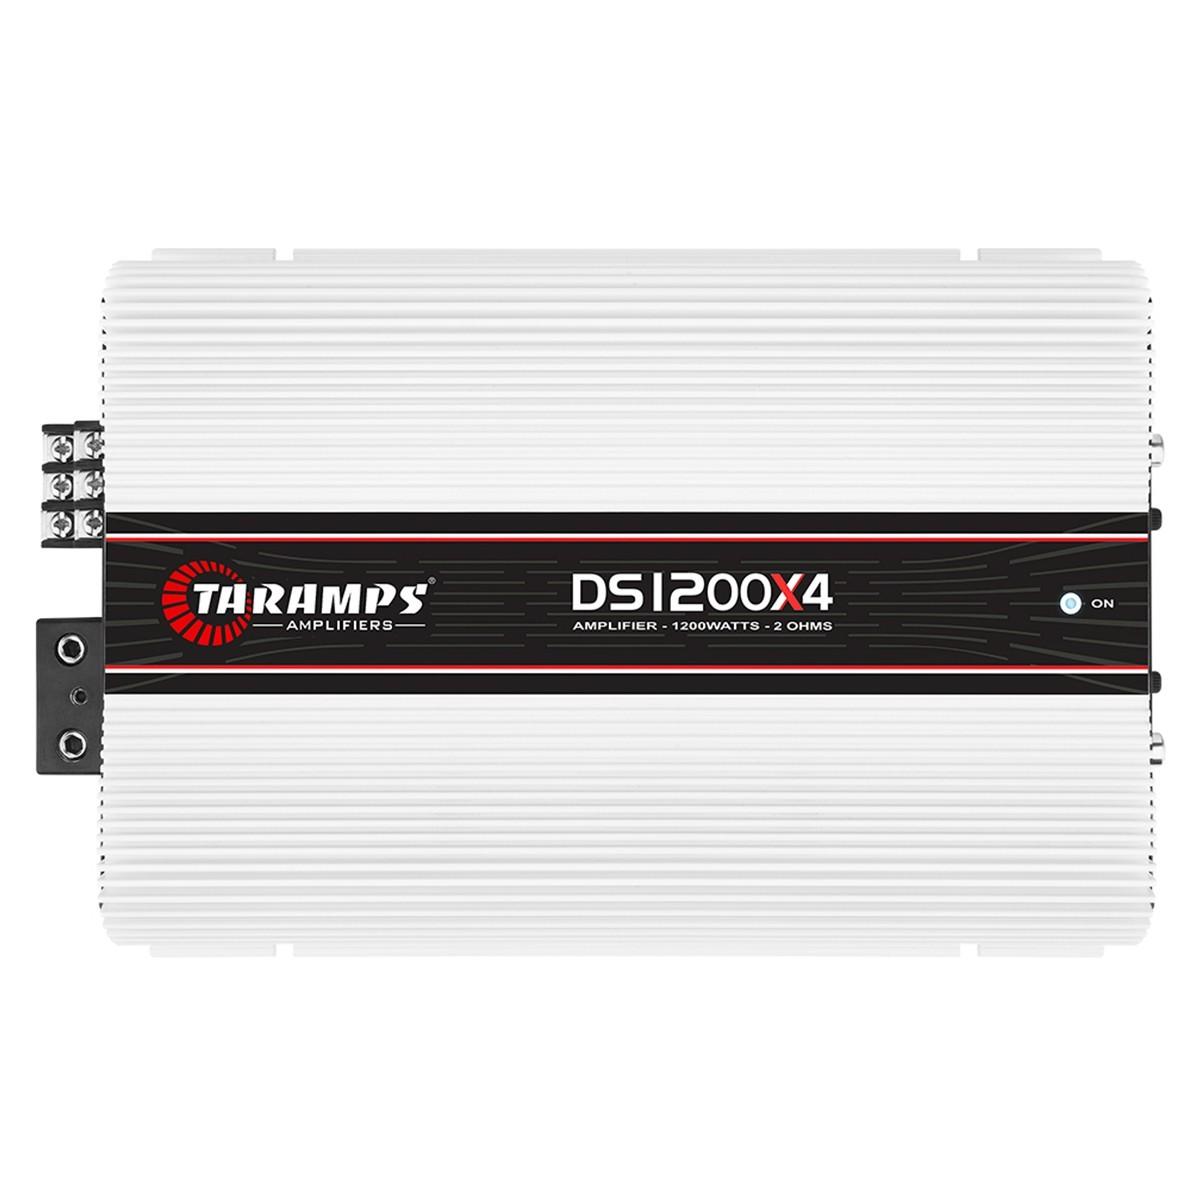 Módulo Amplificador DS 1200x4 Taramps Class D 2 OHMS 4 Canais 300 Watts RMS